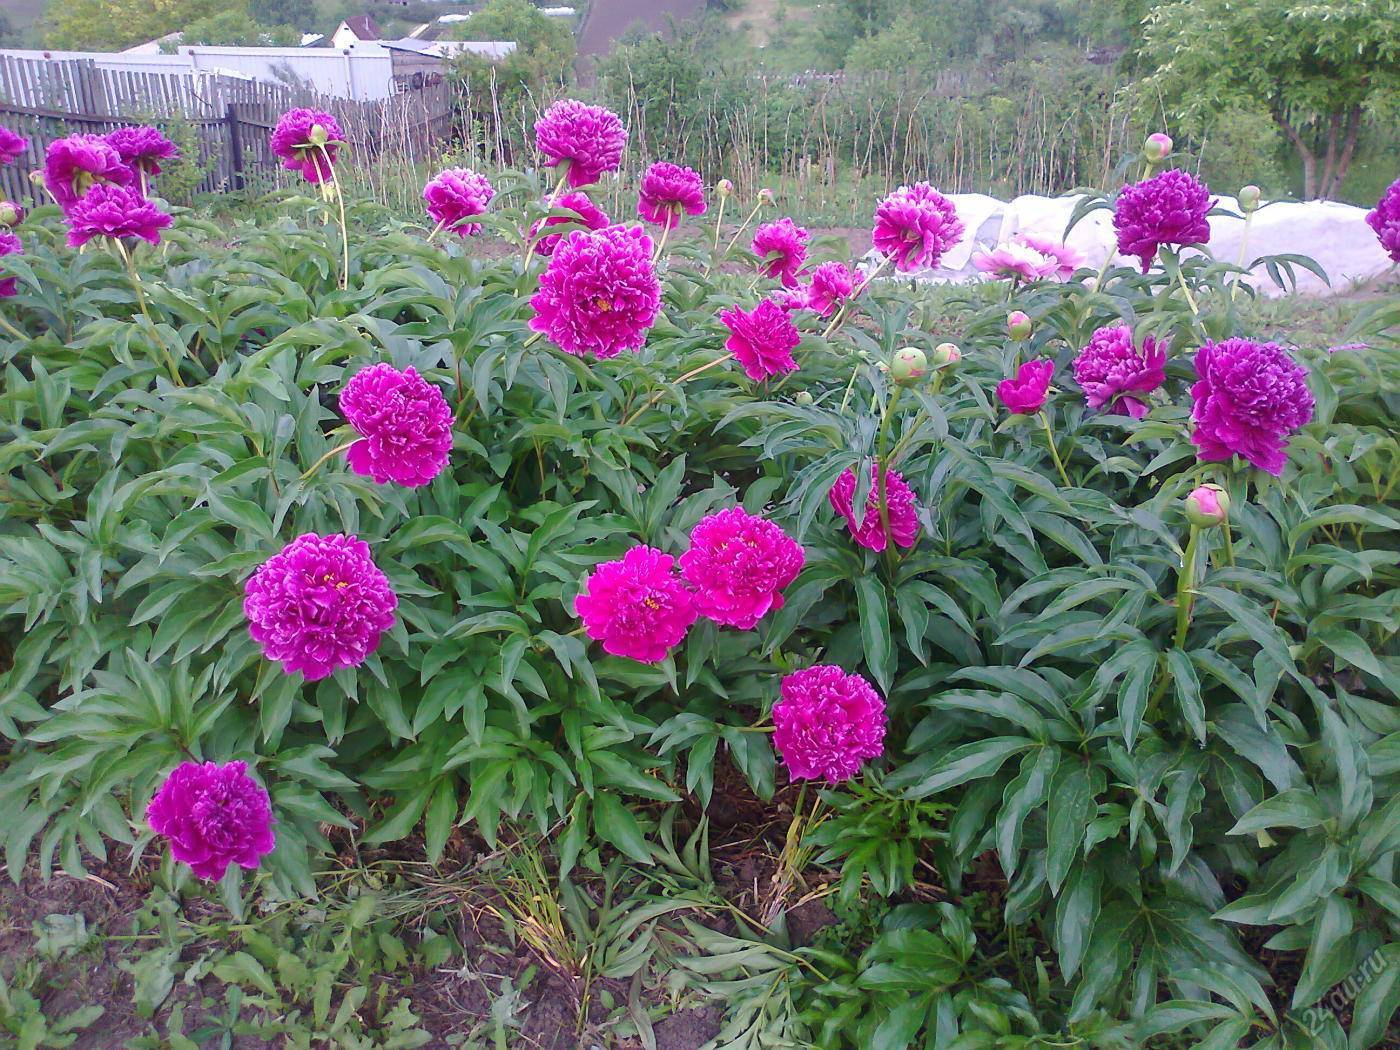 Все о травянистом молочноцветковом пионе пинк гавайан корал: характеристики сорта